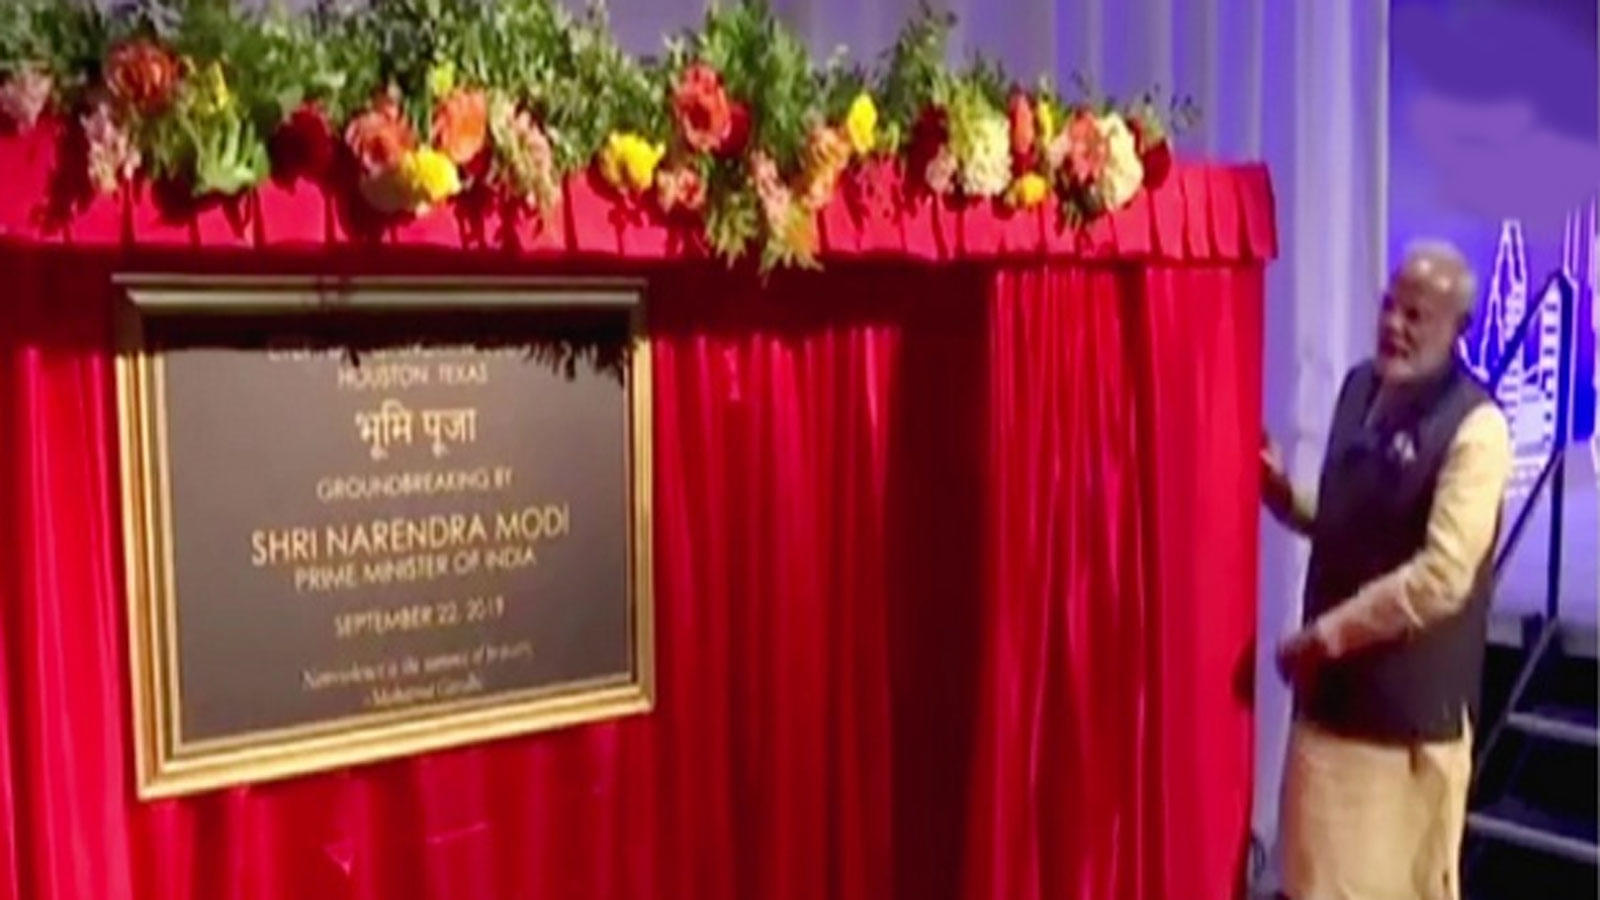 houston-pm-modi-unveils-plaque-for-groundbreaking-ceremony-of-eternal-gandhi-museum